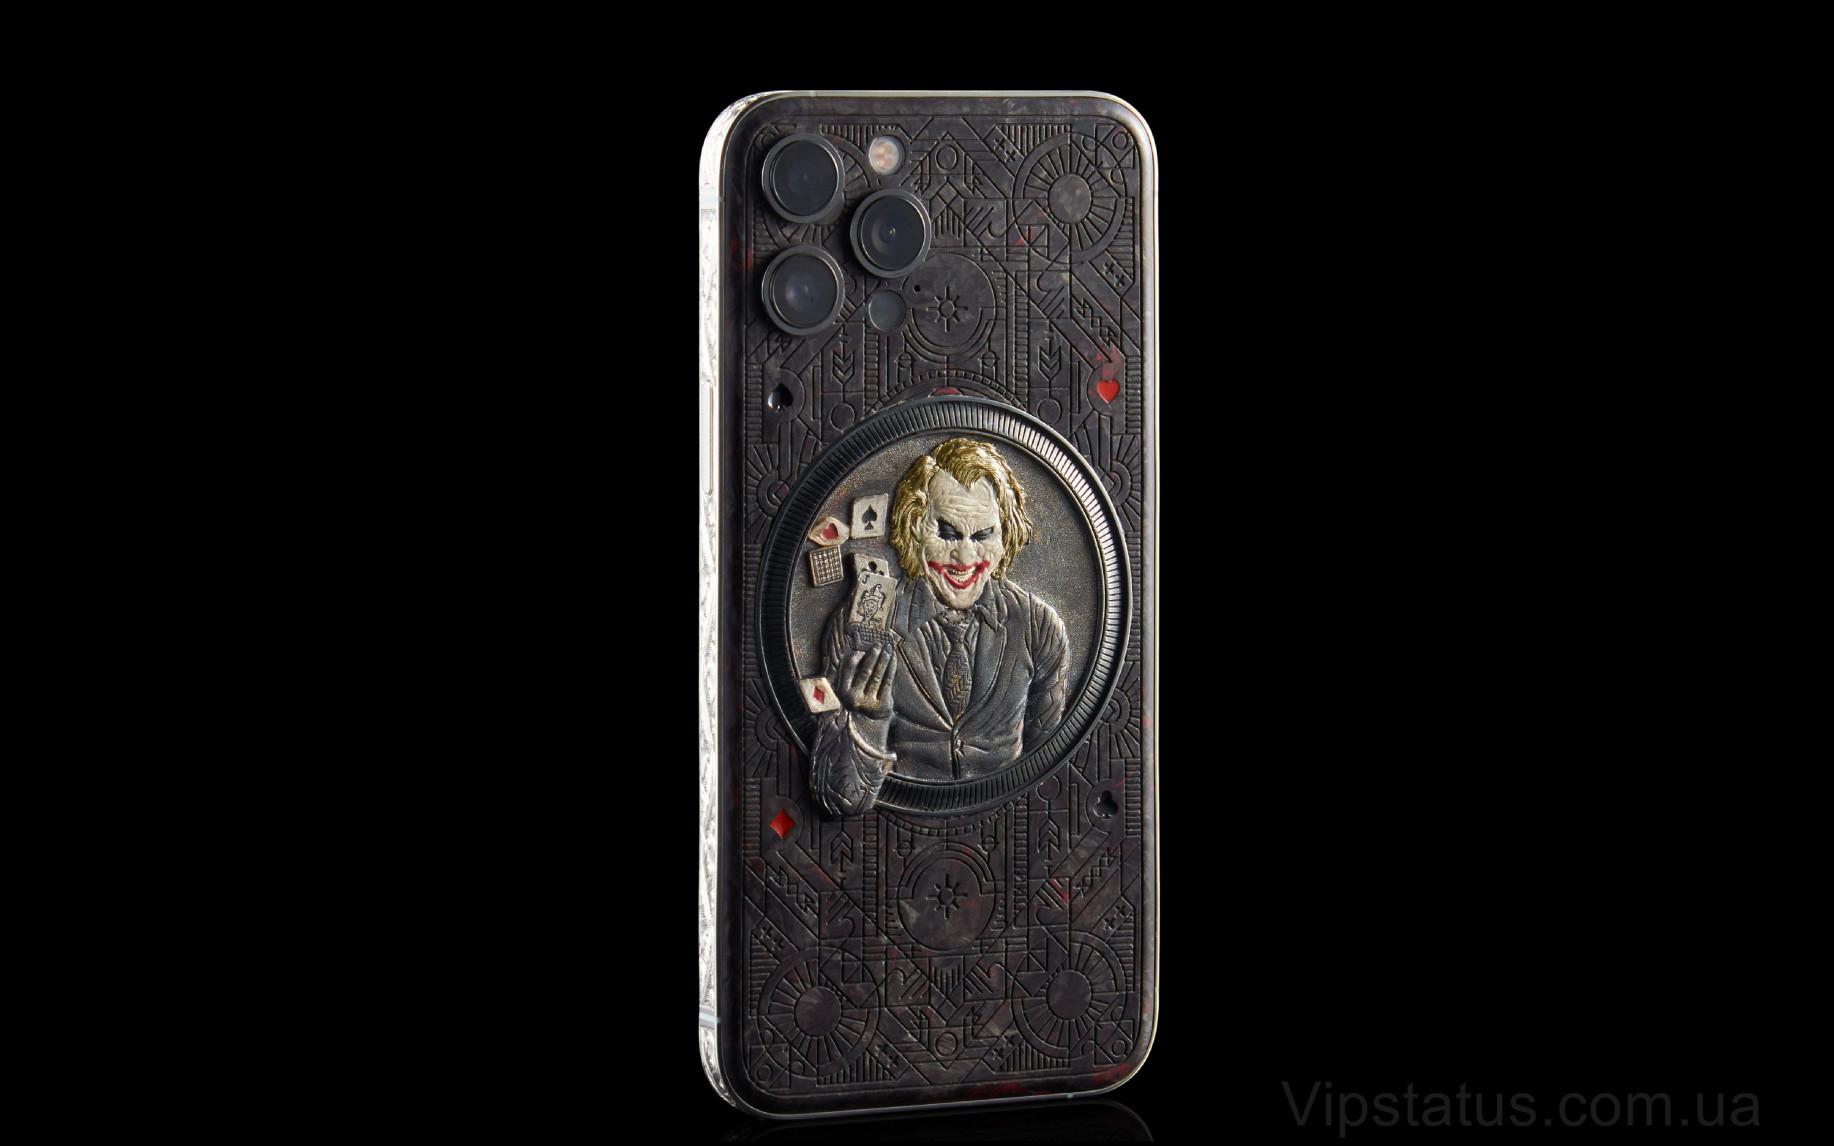 Elite Dark Joker IPHONE 13 PRO MAX 512 GB Dark Joker IPHONE 13 PRO MAX 512 GB image 1